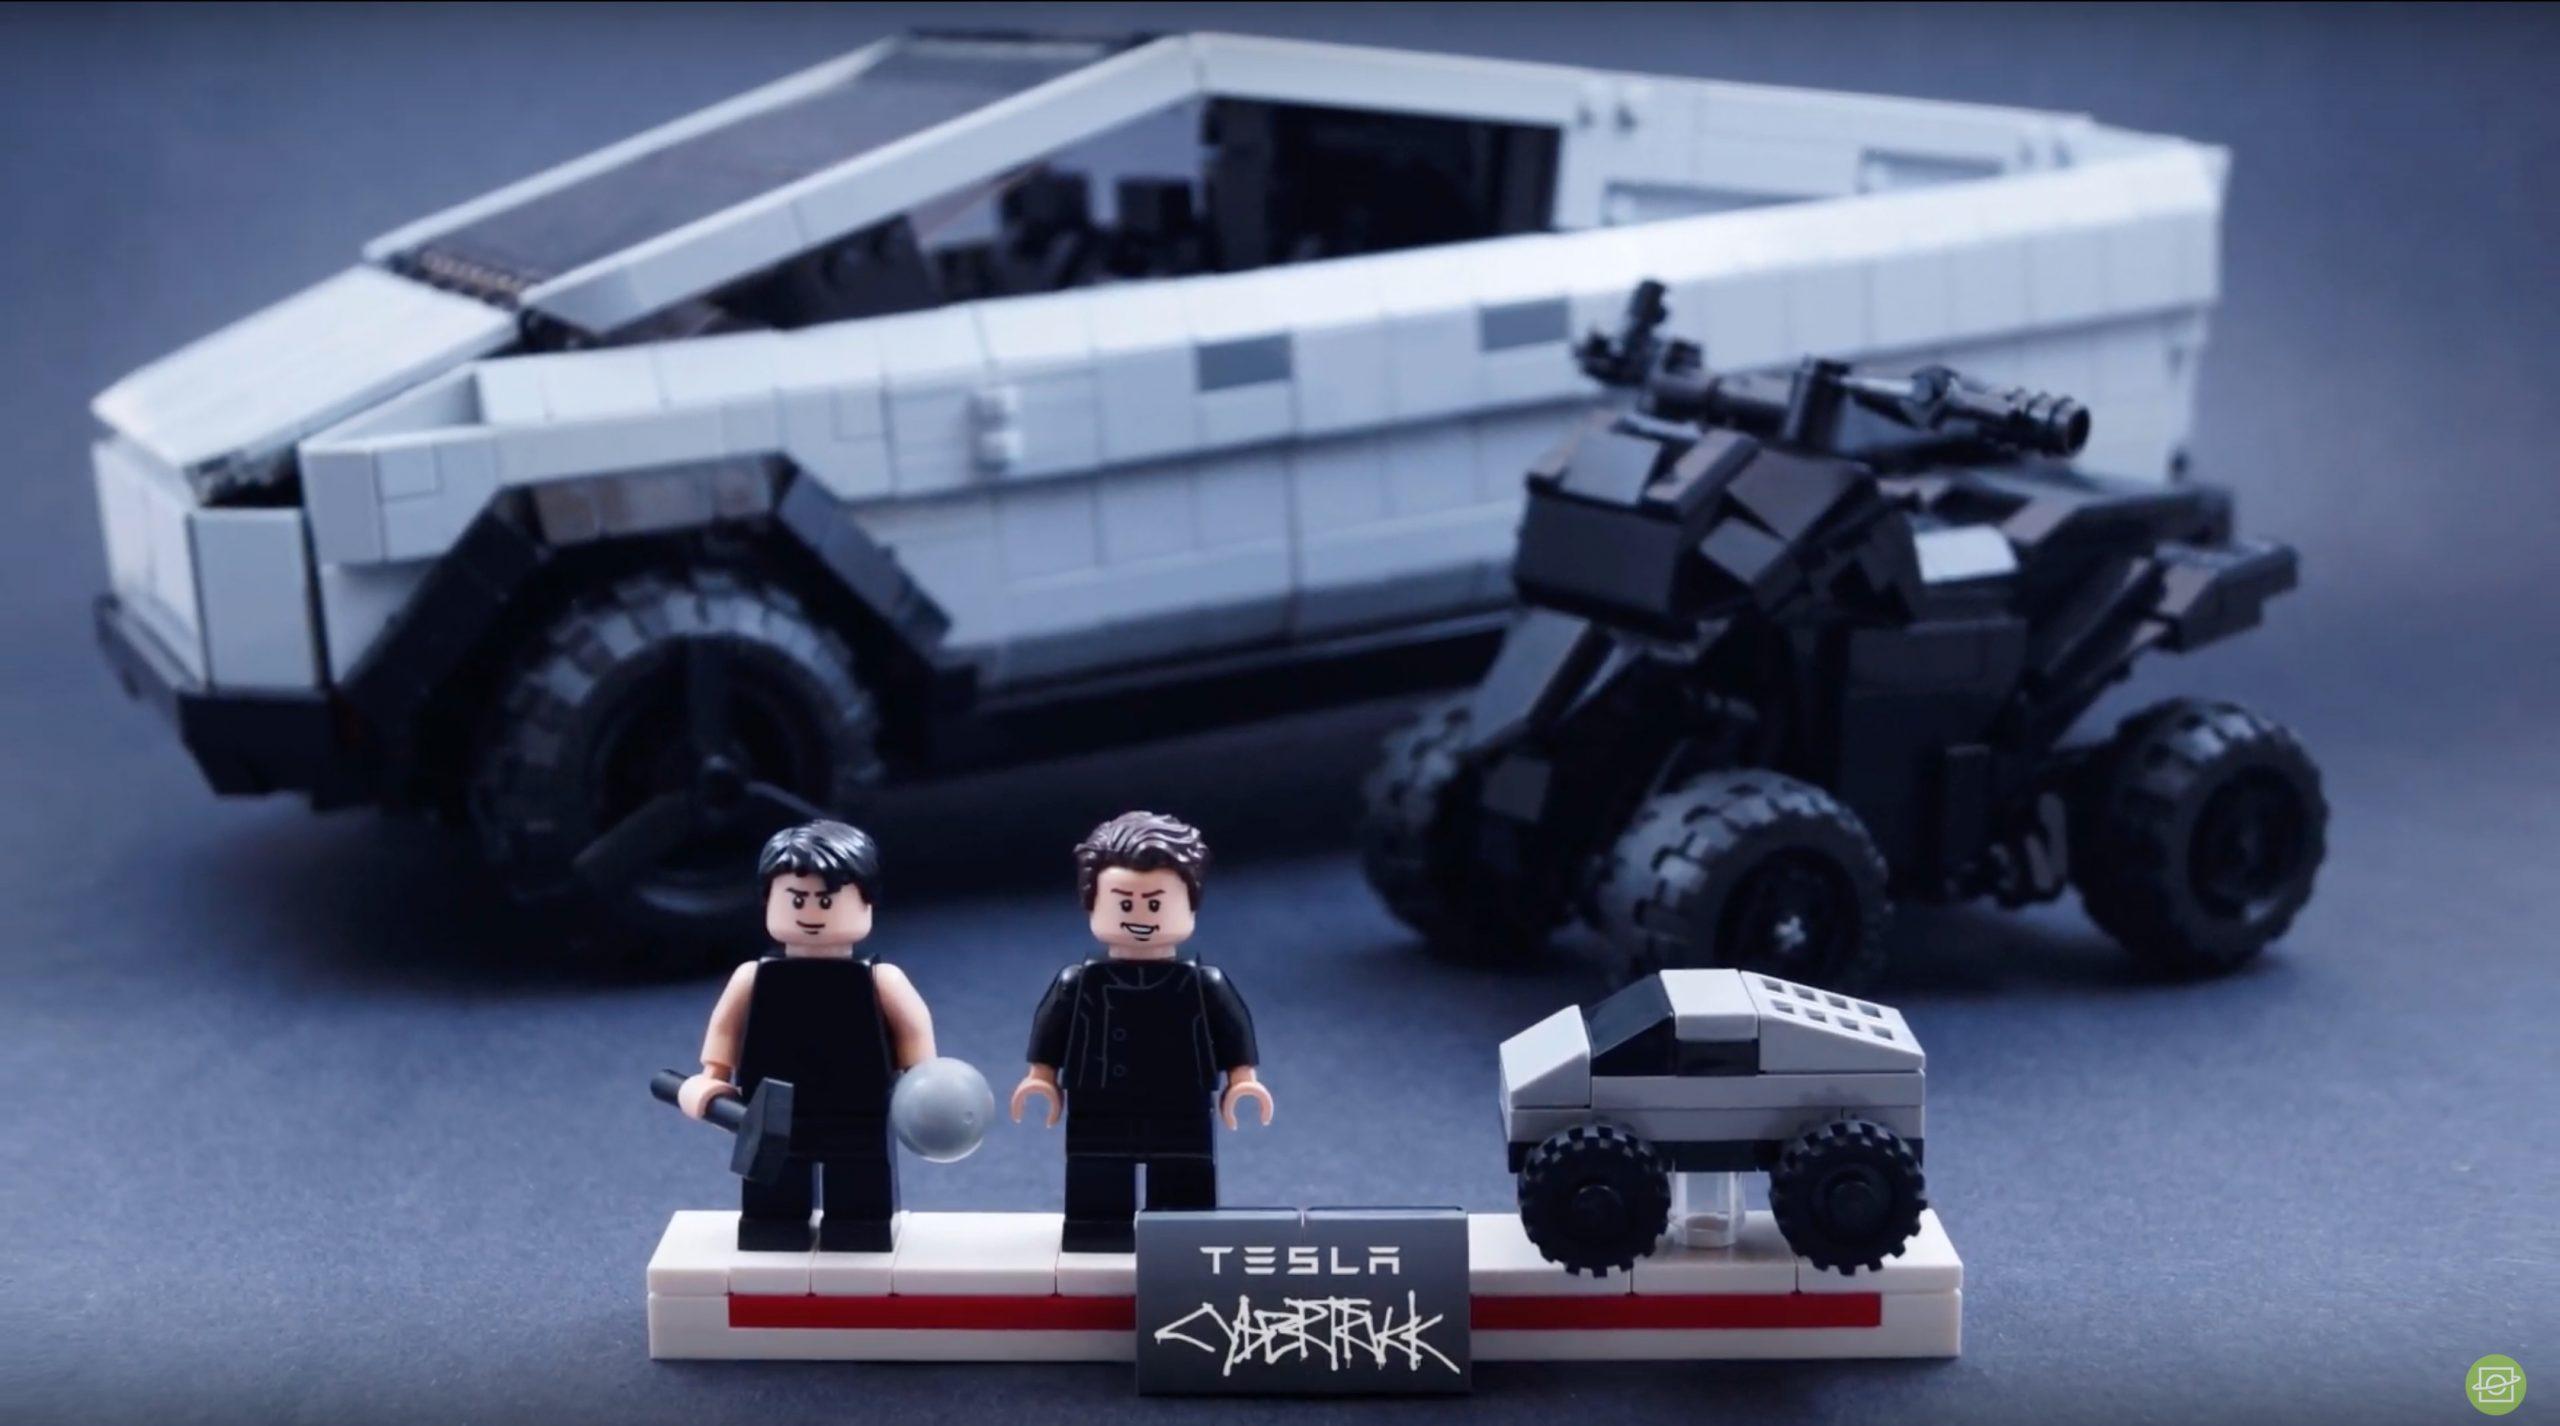 Tesla Cybertruck Lego Kit